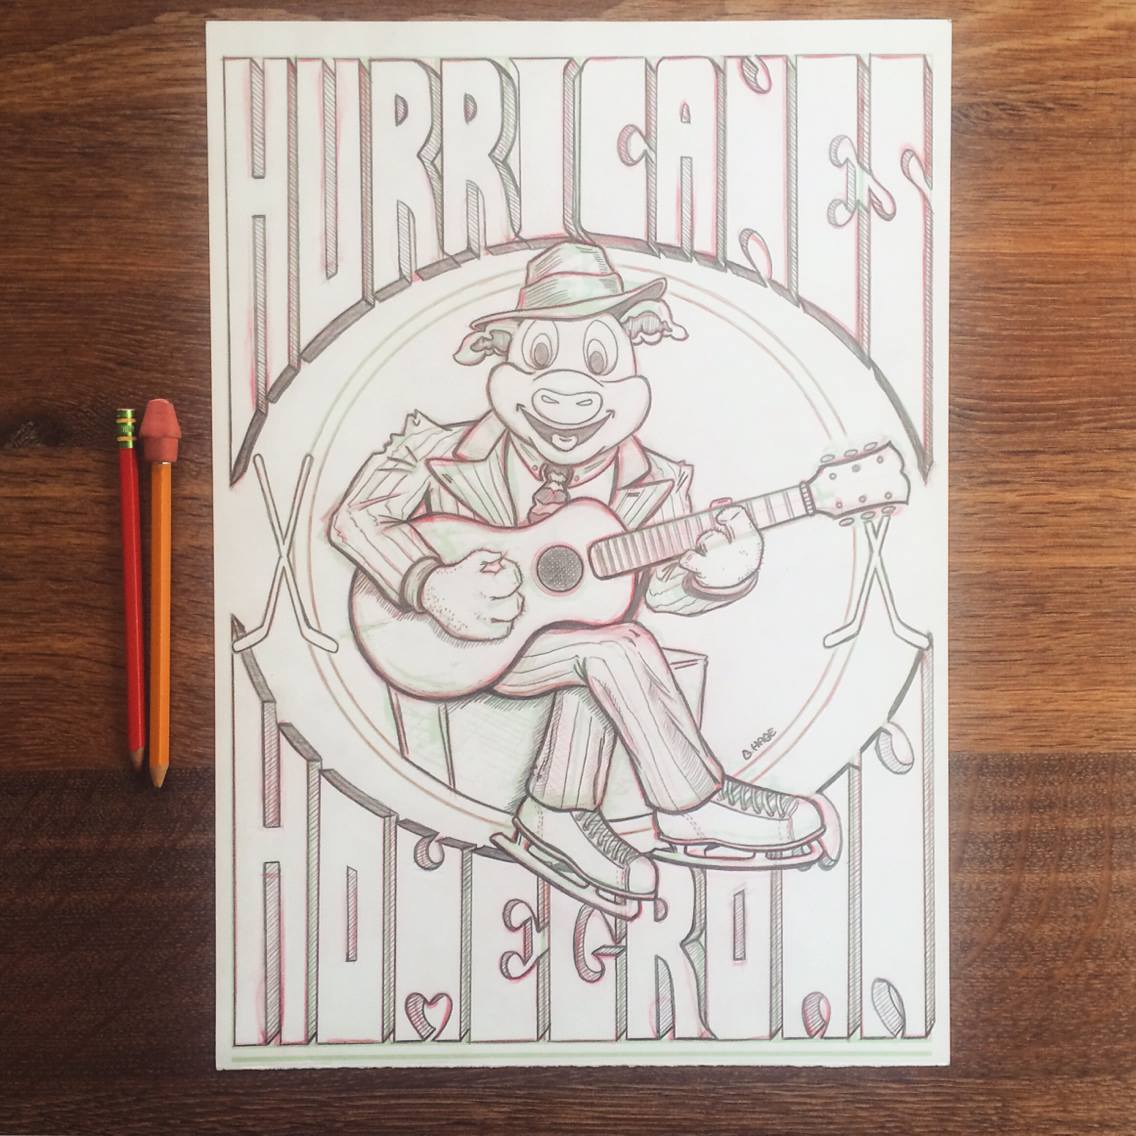 GeorgeHage_HurricanesBlues-Pencils.jpg